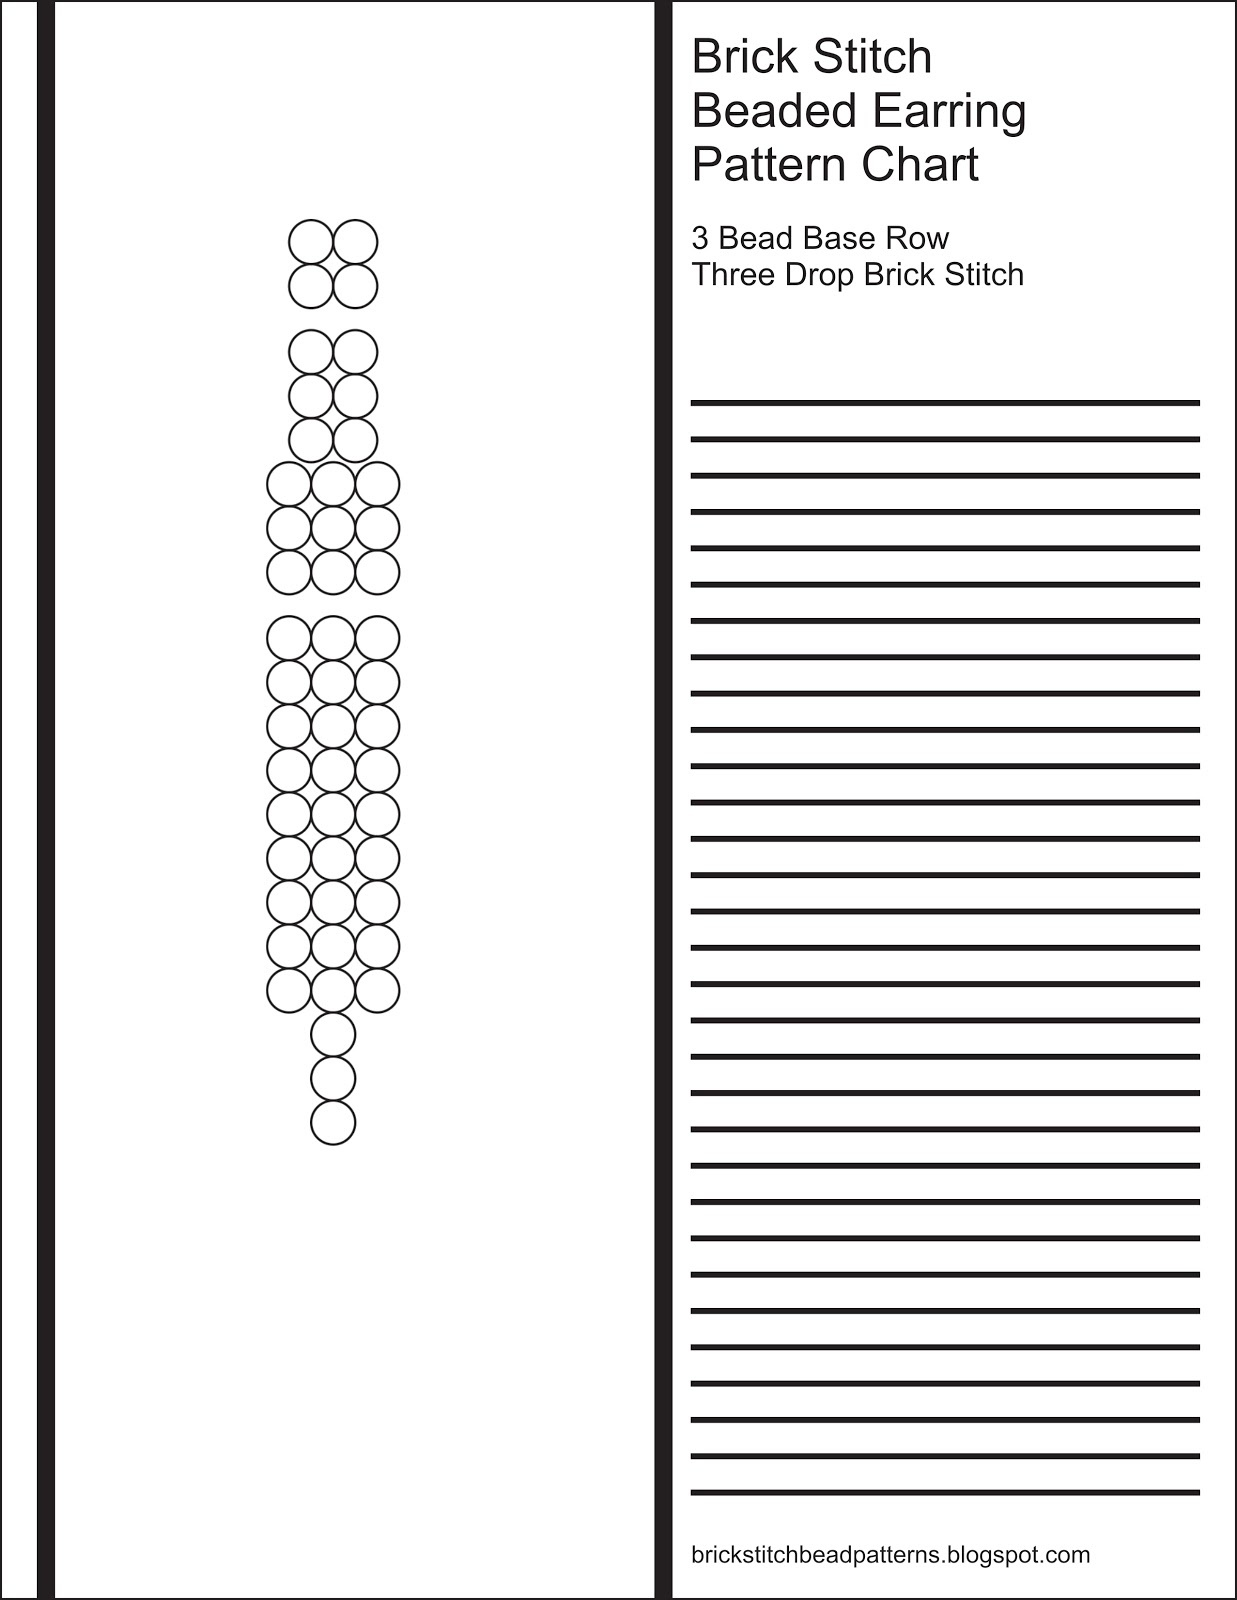 Brick Stitch Bead Patterns Journal: 3 Bead Base Row 3 Drop Blank - Free Printable Beading Patterns